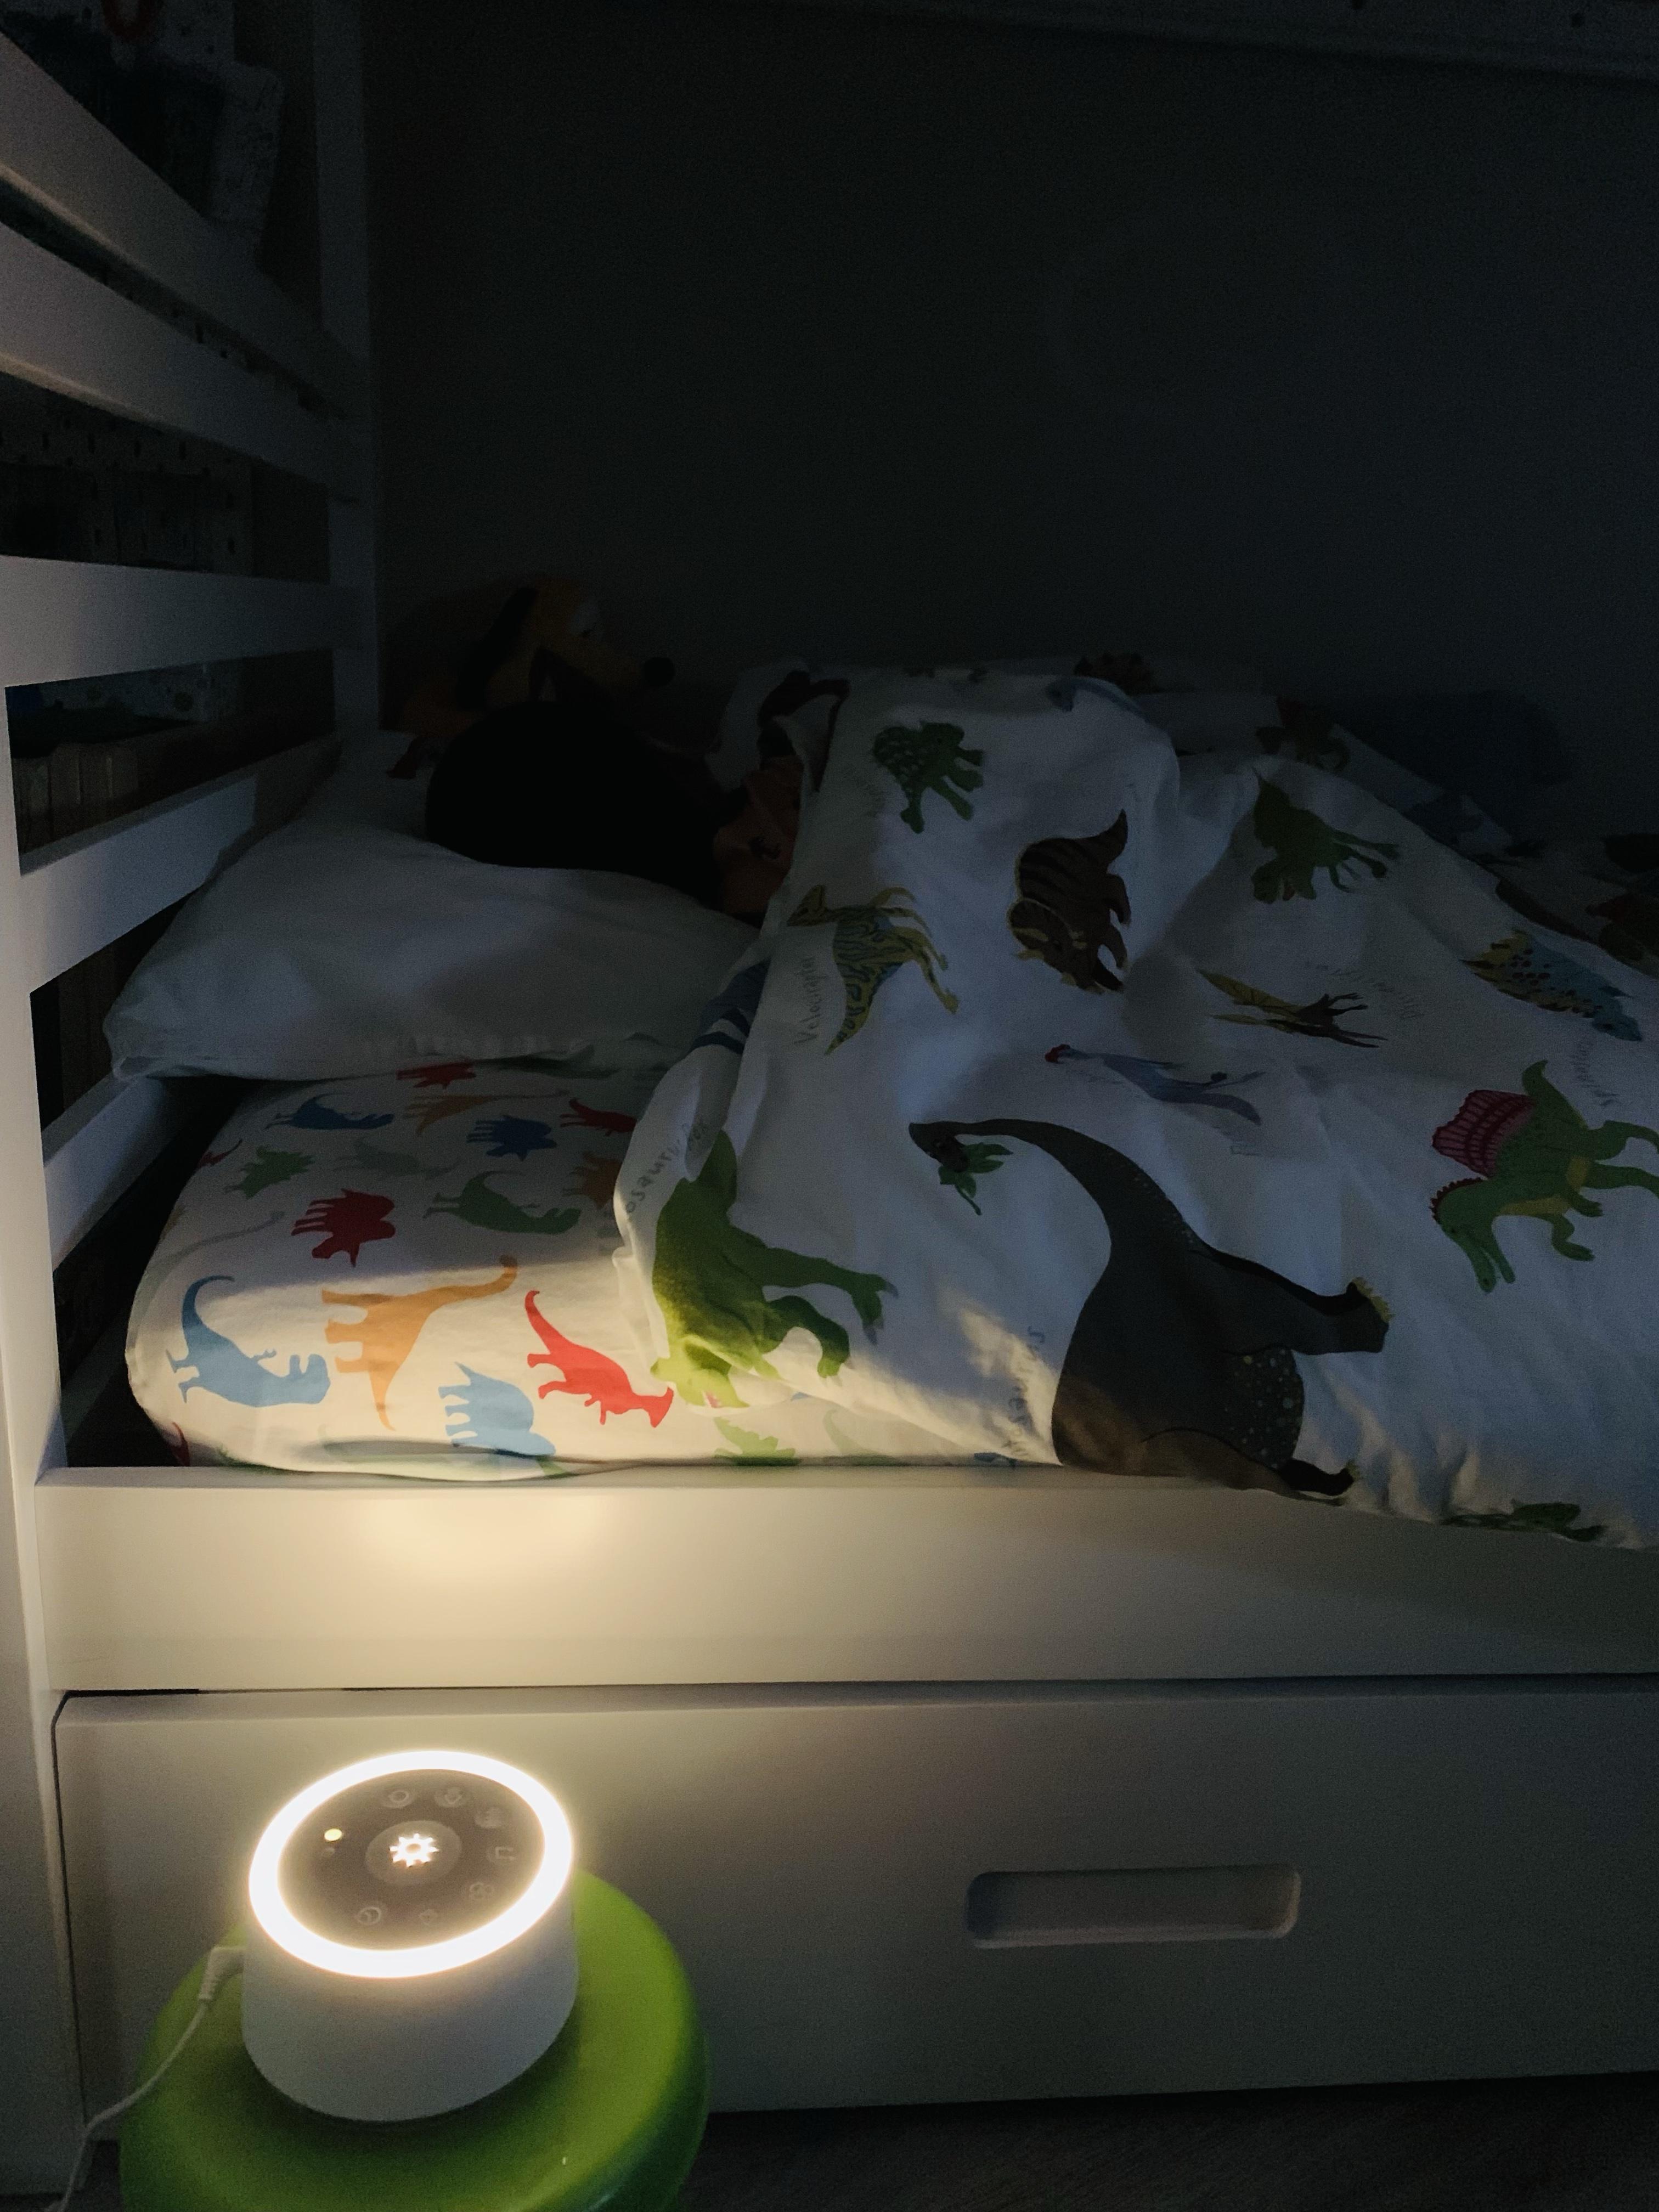 Aarav sleeping with Dreamegg's White Noise Machine